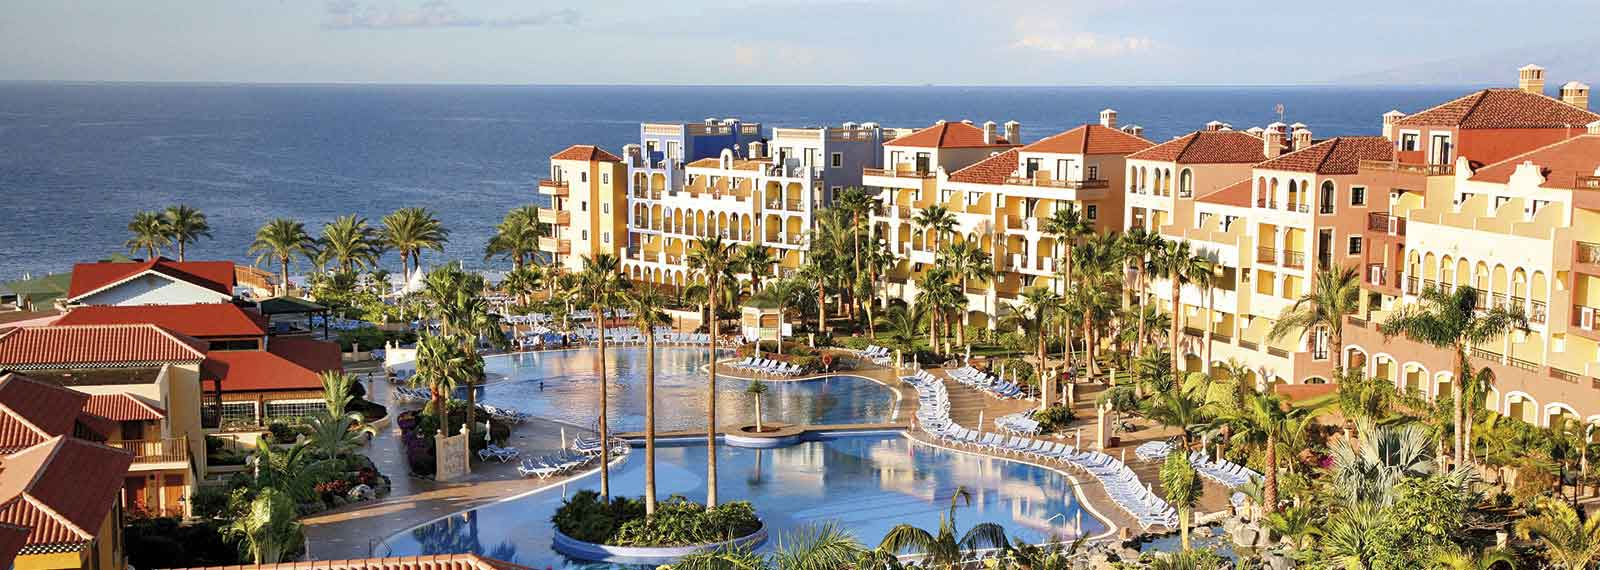 Sunlight Bahia Principe Costa Adeje Bahia Principe Hotels Resorts